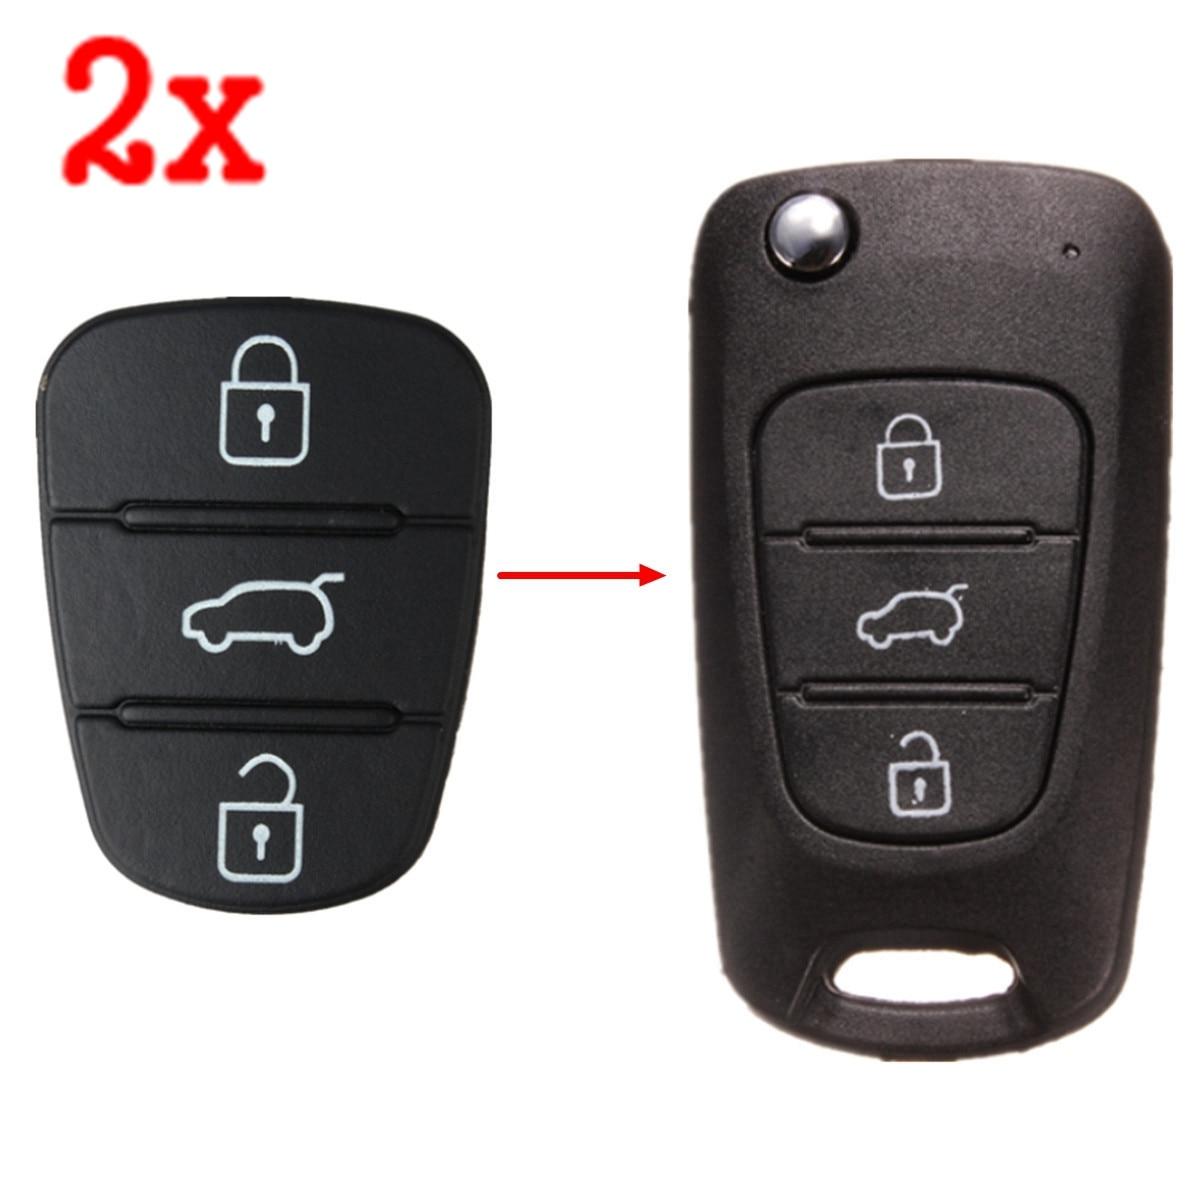 2x 3 Button Remote Key Fob Case Rubber Pad For Hyundai I10 I20 I30 Flip Key Key Shell Case for Car free shipping 2 button flip remote key case for hyundai verna 10pcs lot